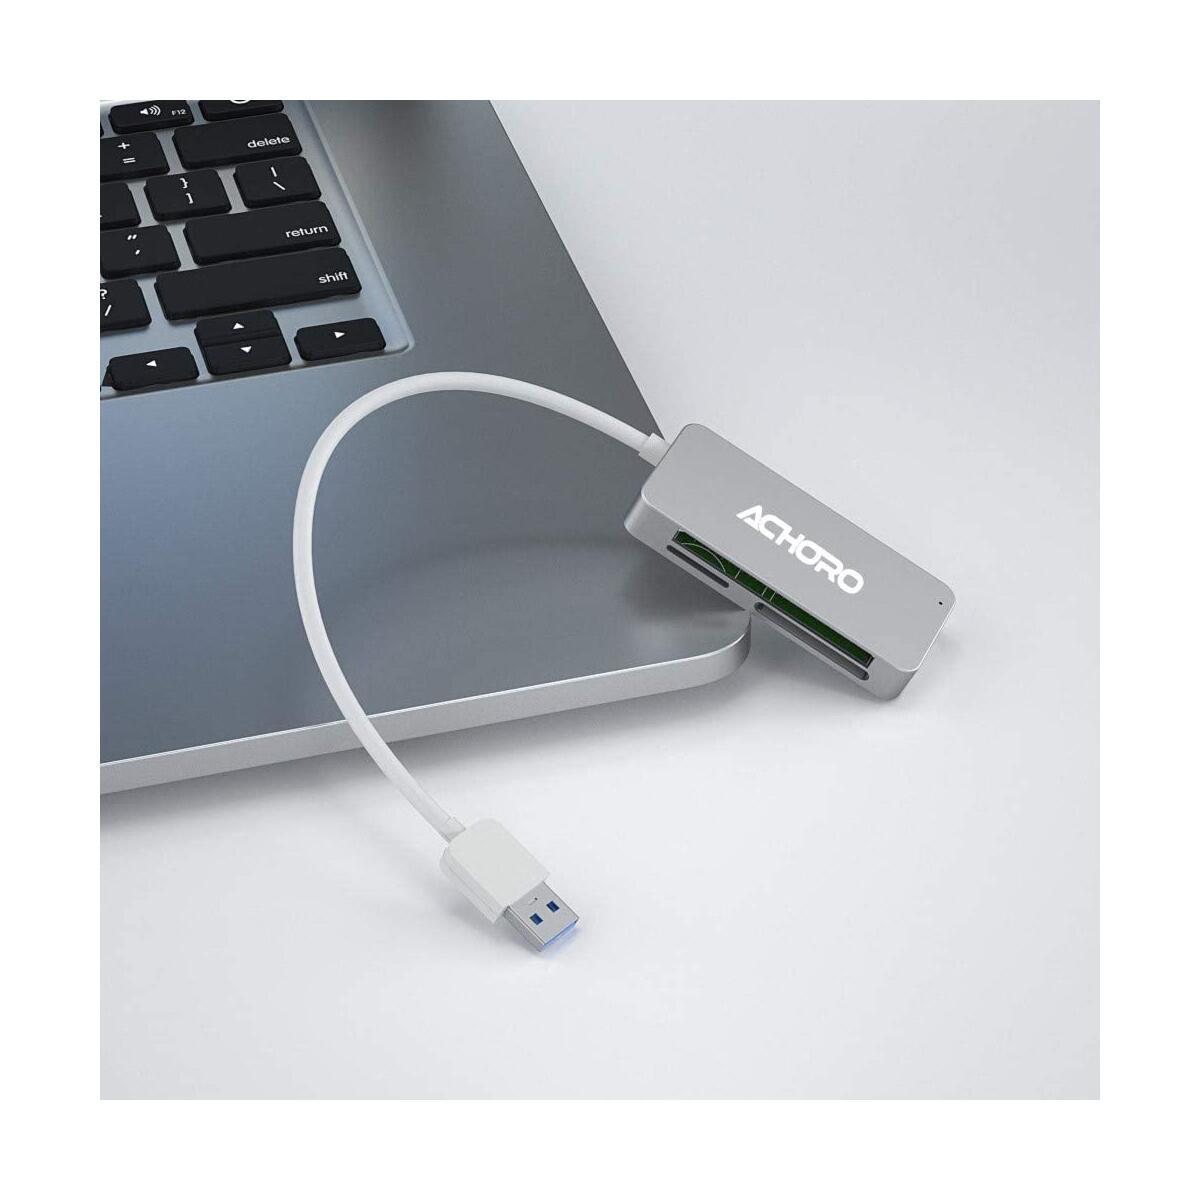 Achoro 3 in 1 SD TF CF Card Reader Compact Design Combo - Aluminum Housing Supports SD-XC, SD, SD2.0, MMC, RS-MMC, SD-HC, Micro SD, Mini SD, CF (Silver)